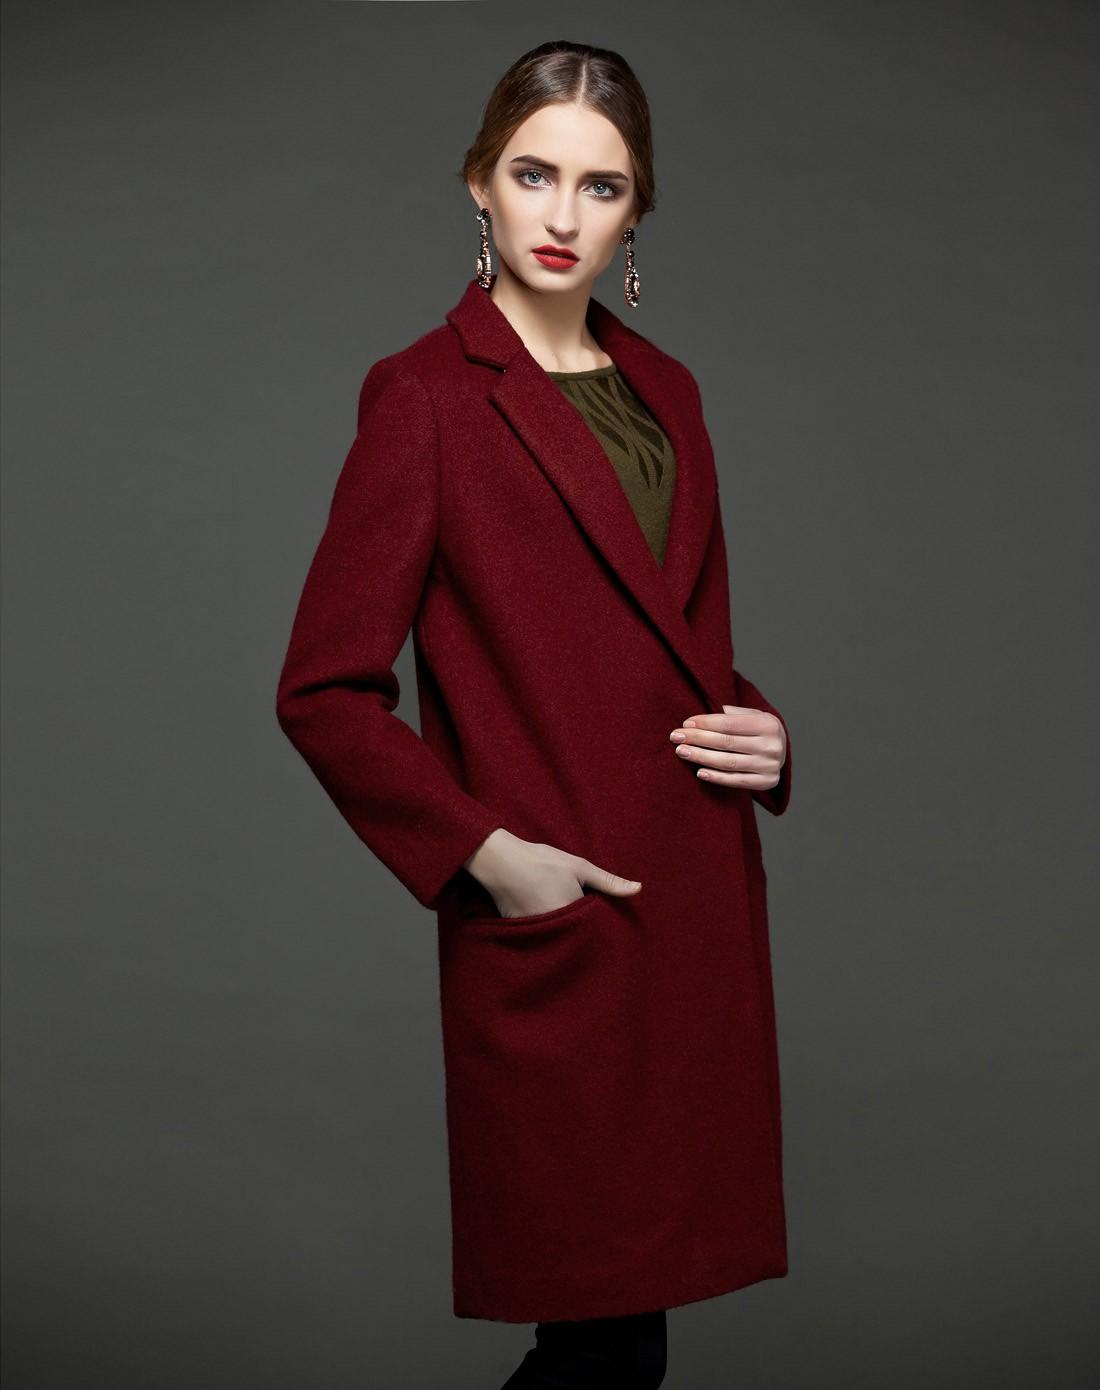 lux酒紅色西服翻領知性夾棉羊毛大衣外套03663rd01